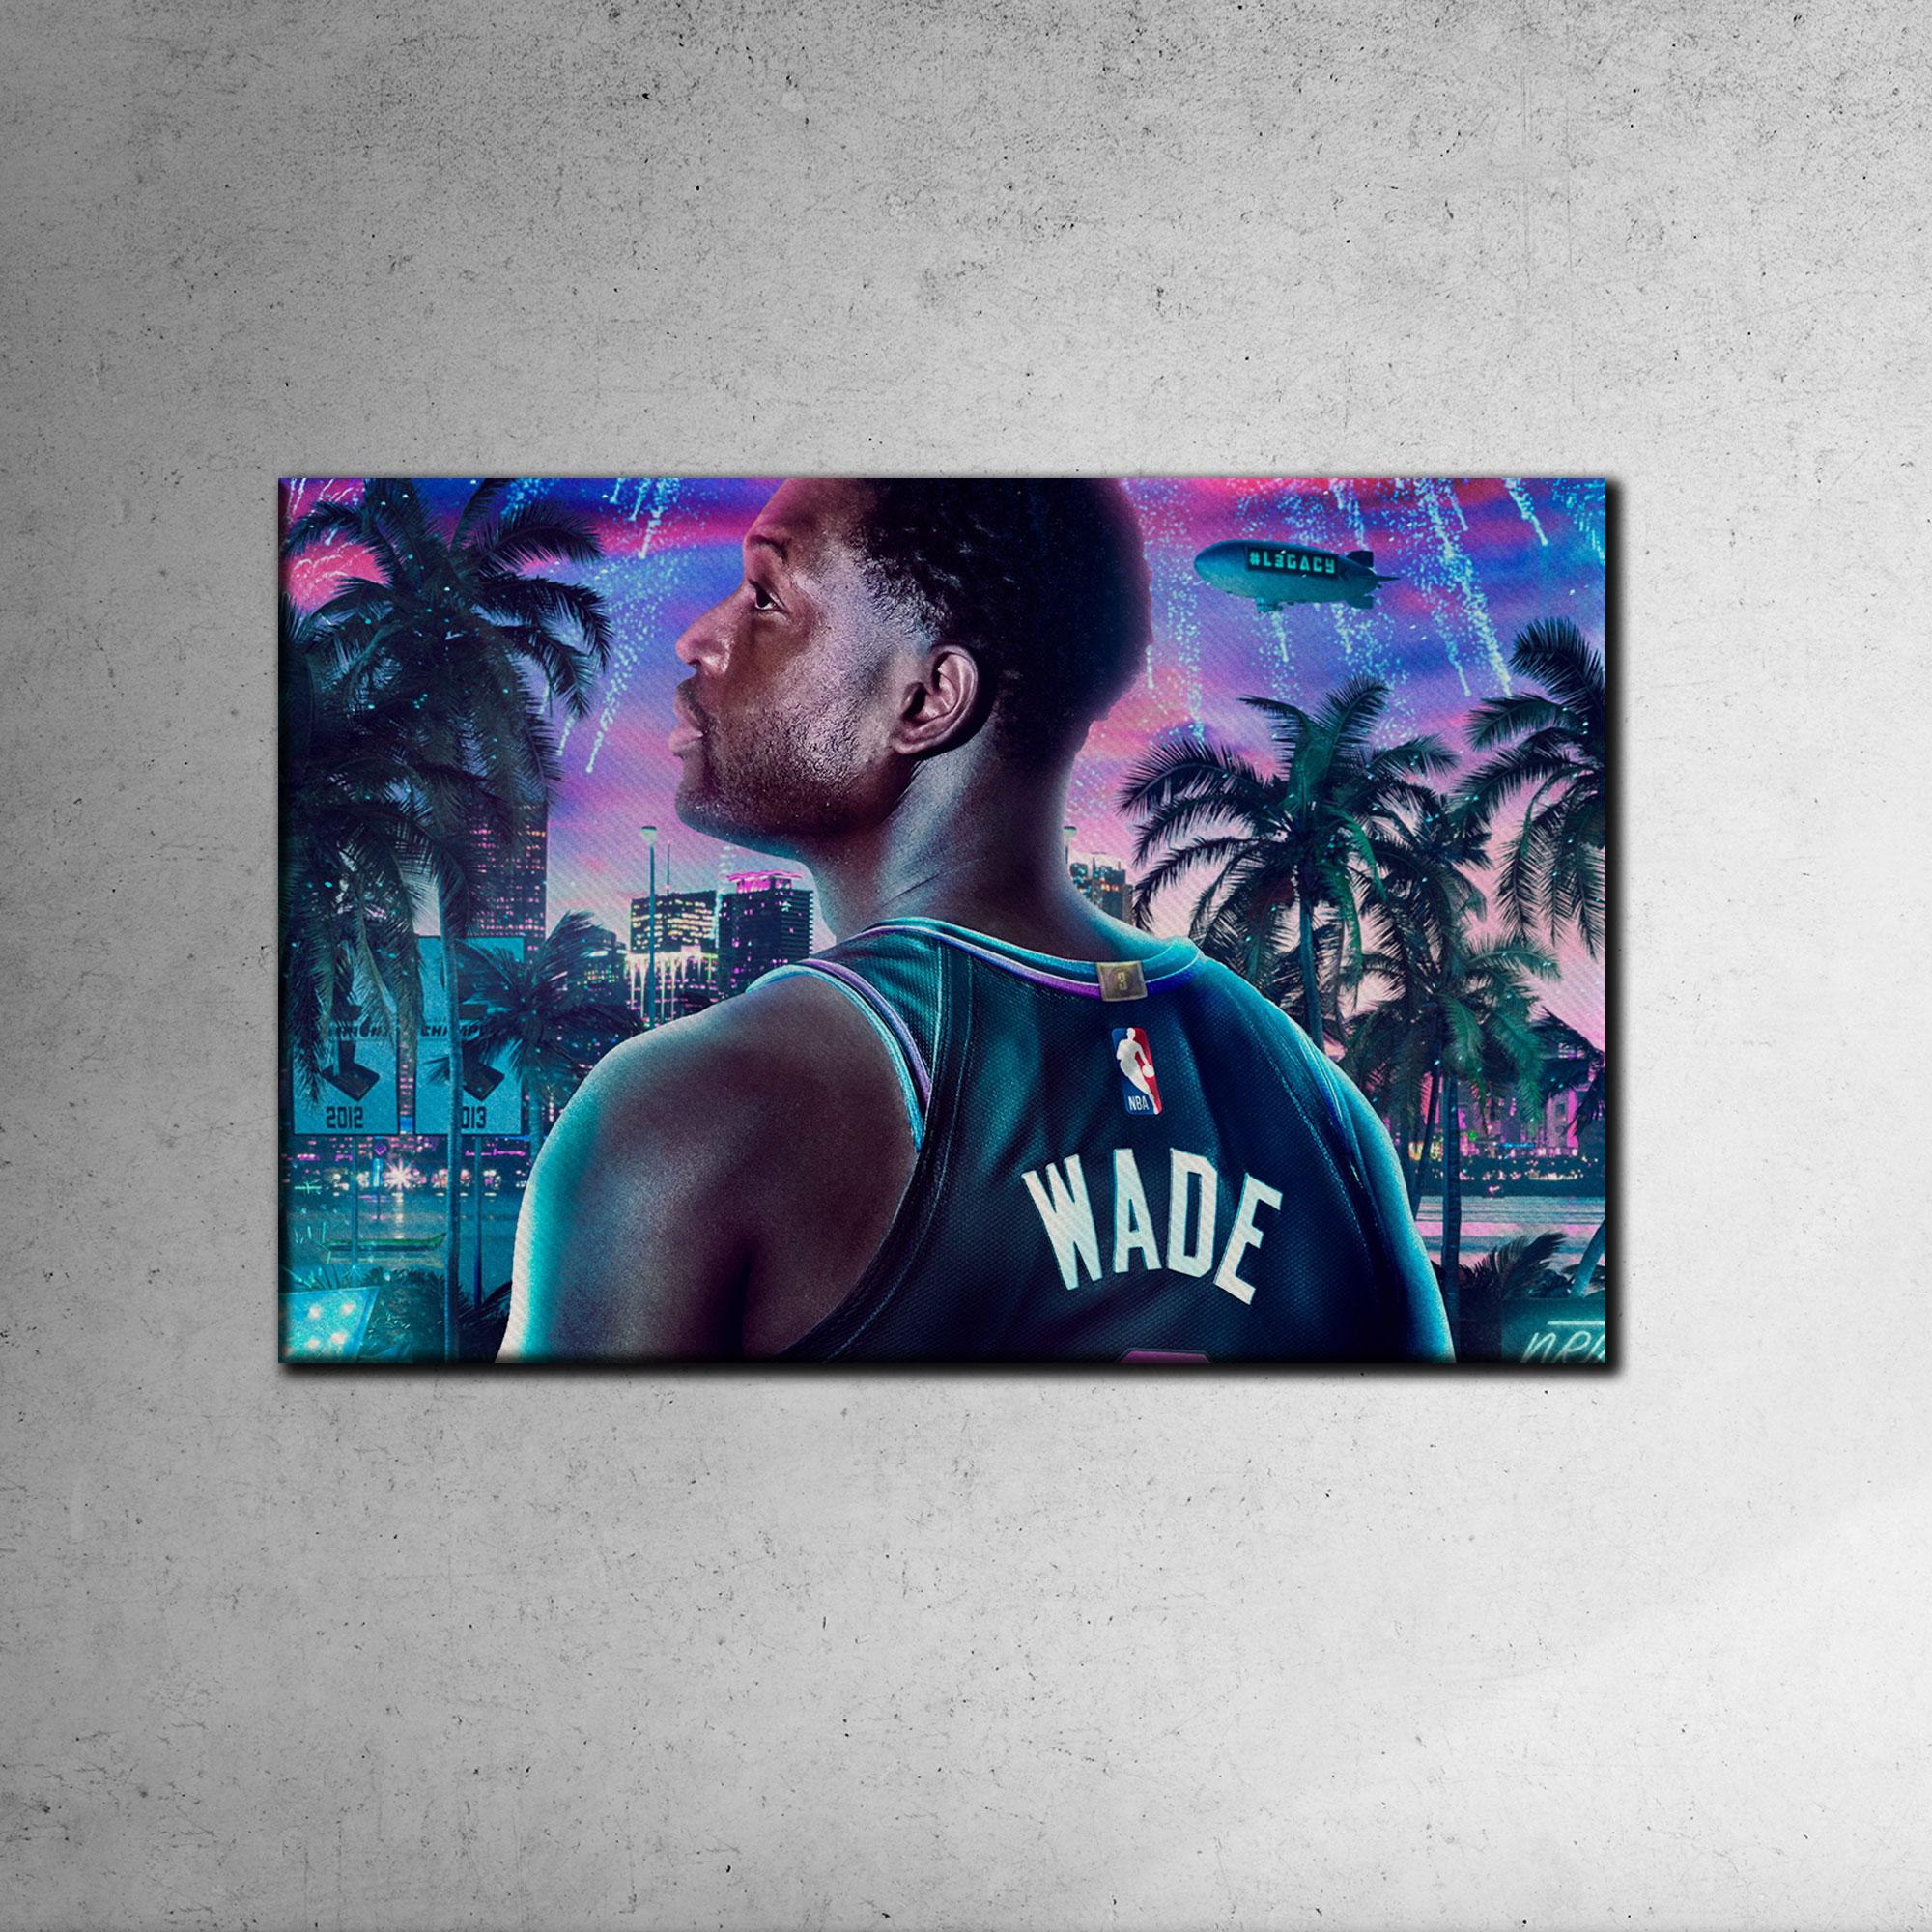 Dwayne Wade Canvas Tablo (Nba-canvas-dwayne1)